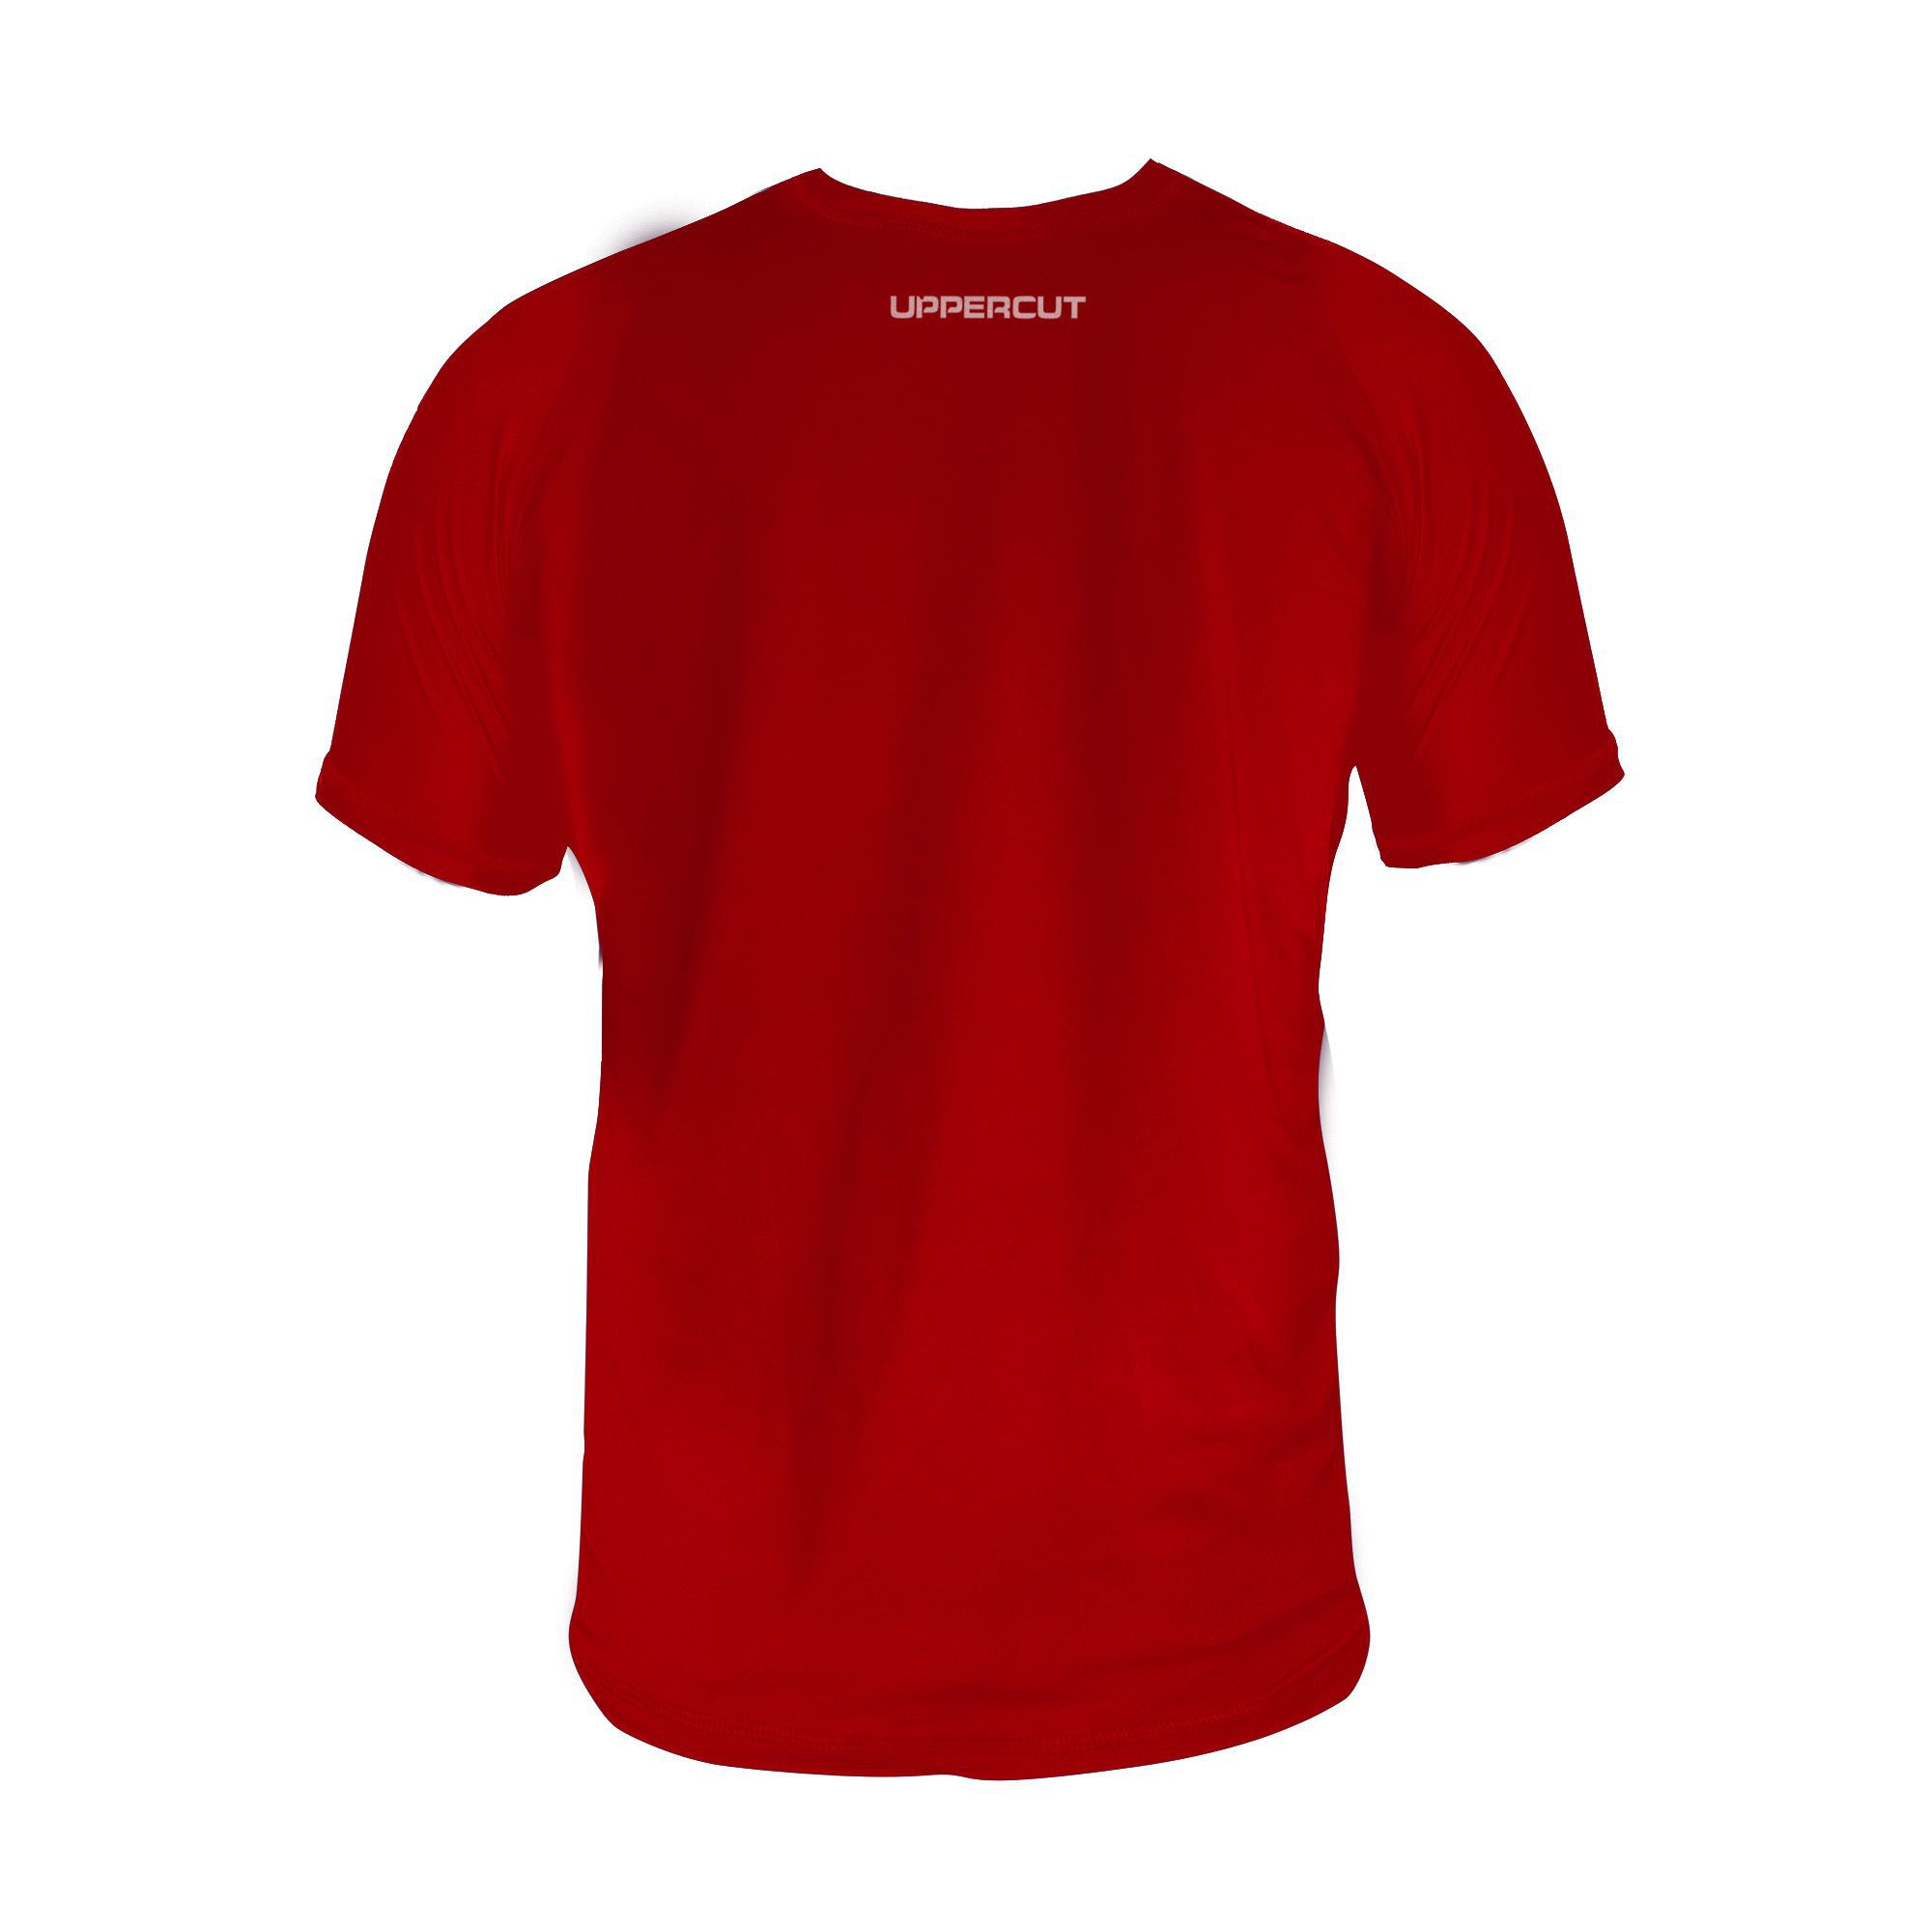 Camiseta Jiu-Jitsu Raspagem Uppercut Dry U.V